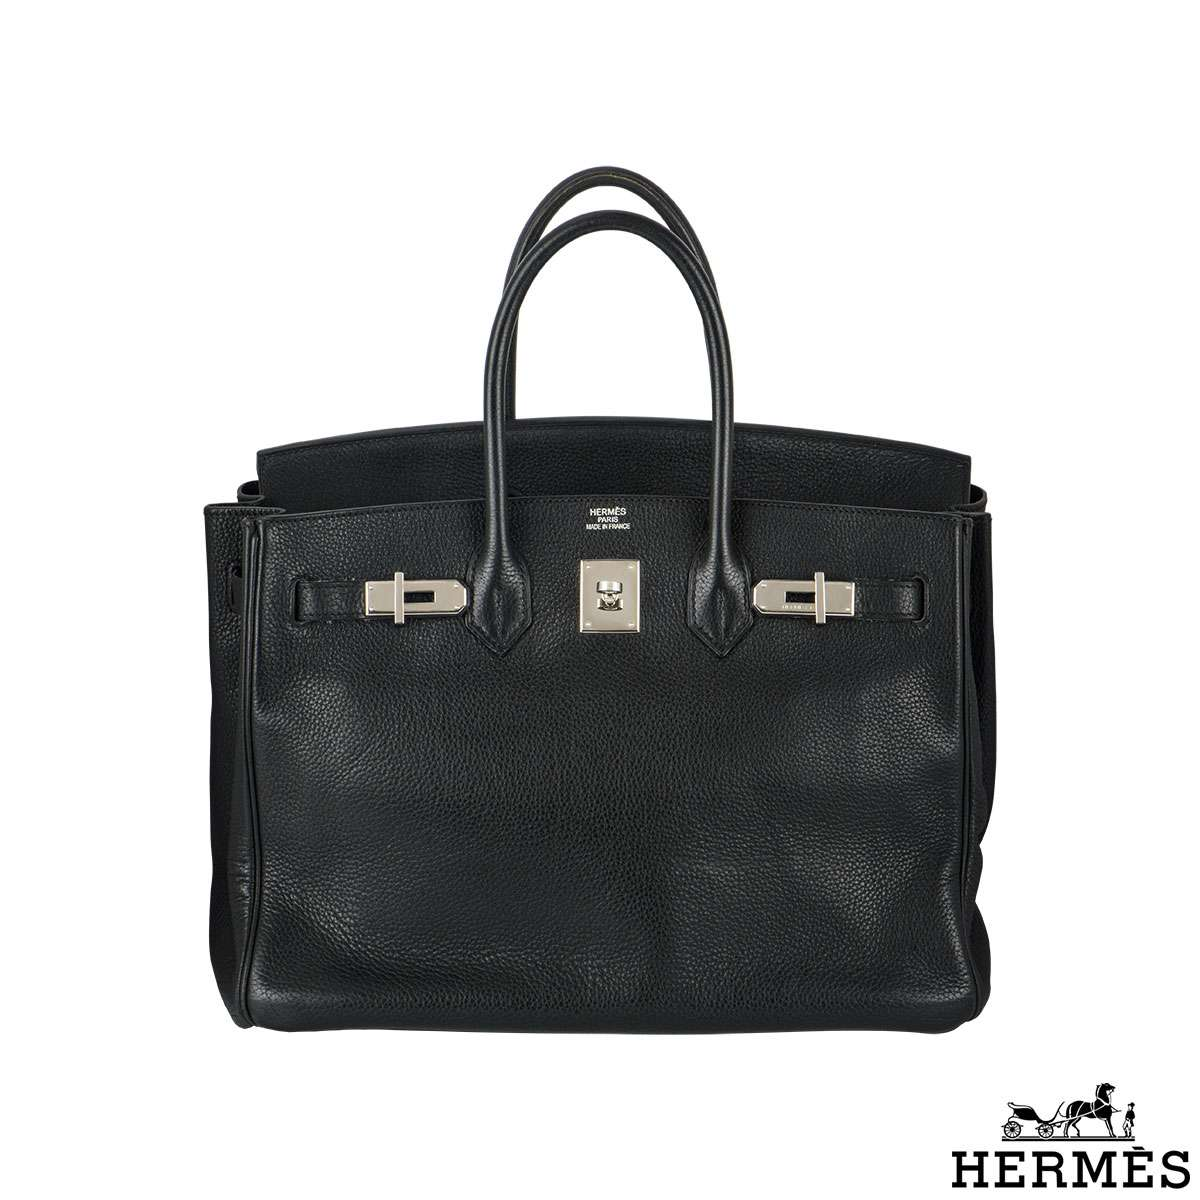 Hermes Birkin 35cm Togo Leather PHW Handbag